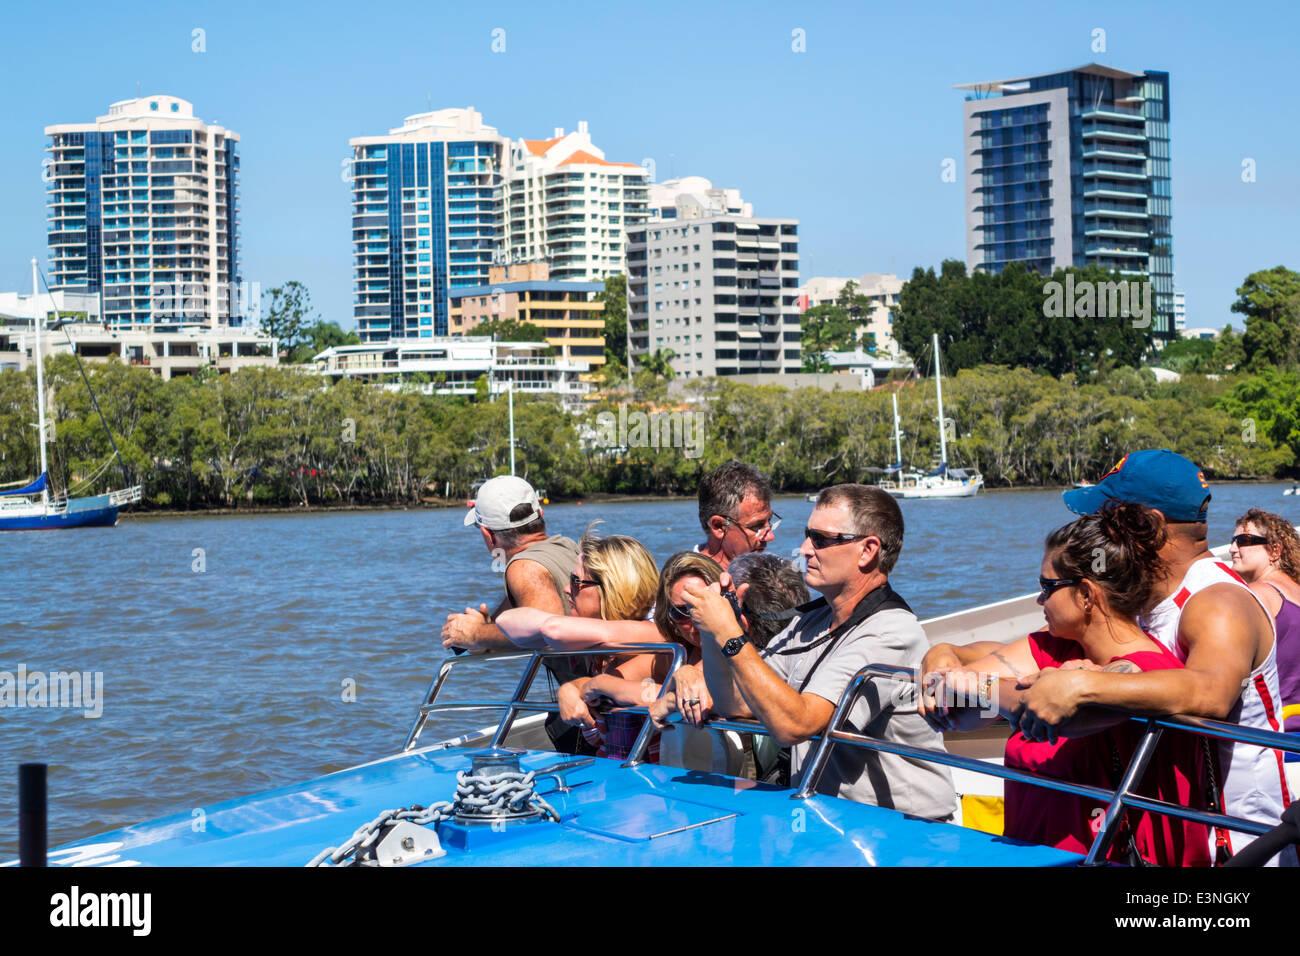 Brisbane Australia Queensland Kangaroo Point Brisbane River CityCat ferry boat public transportation riders passengers - Stock Image